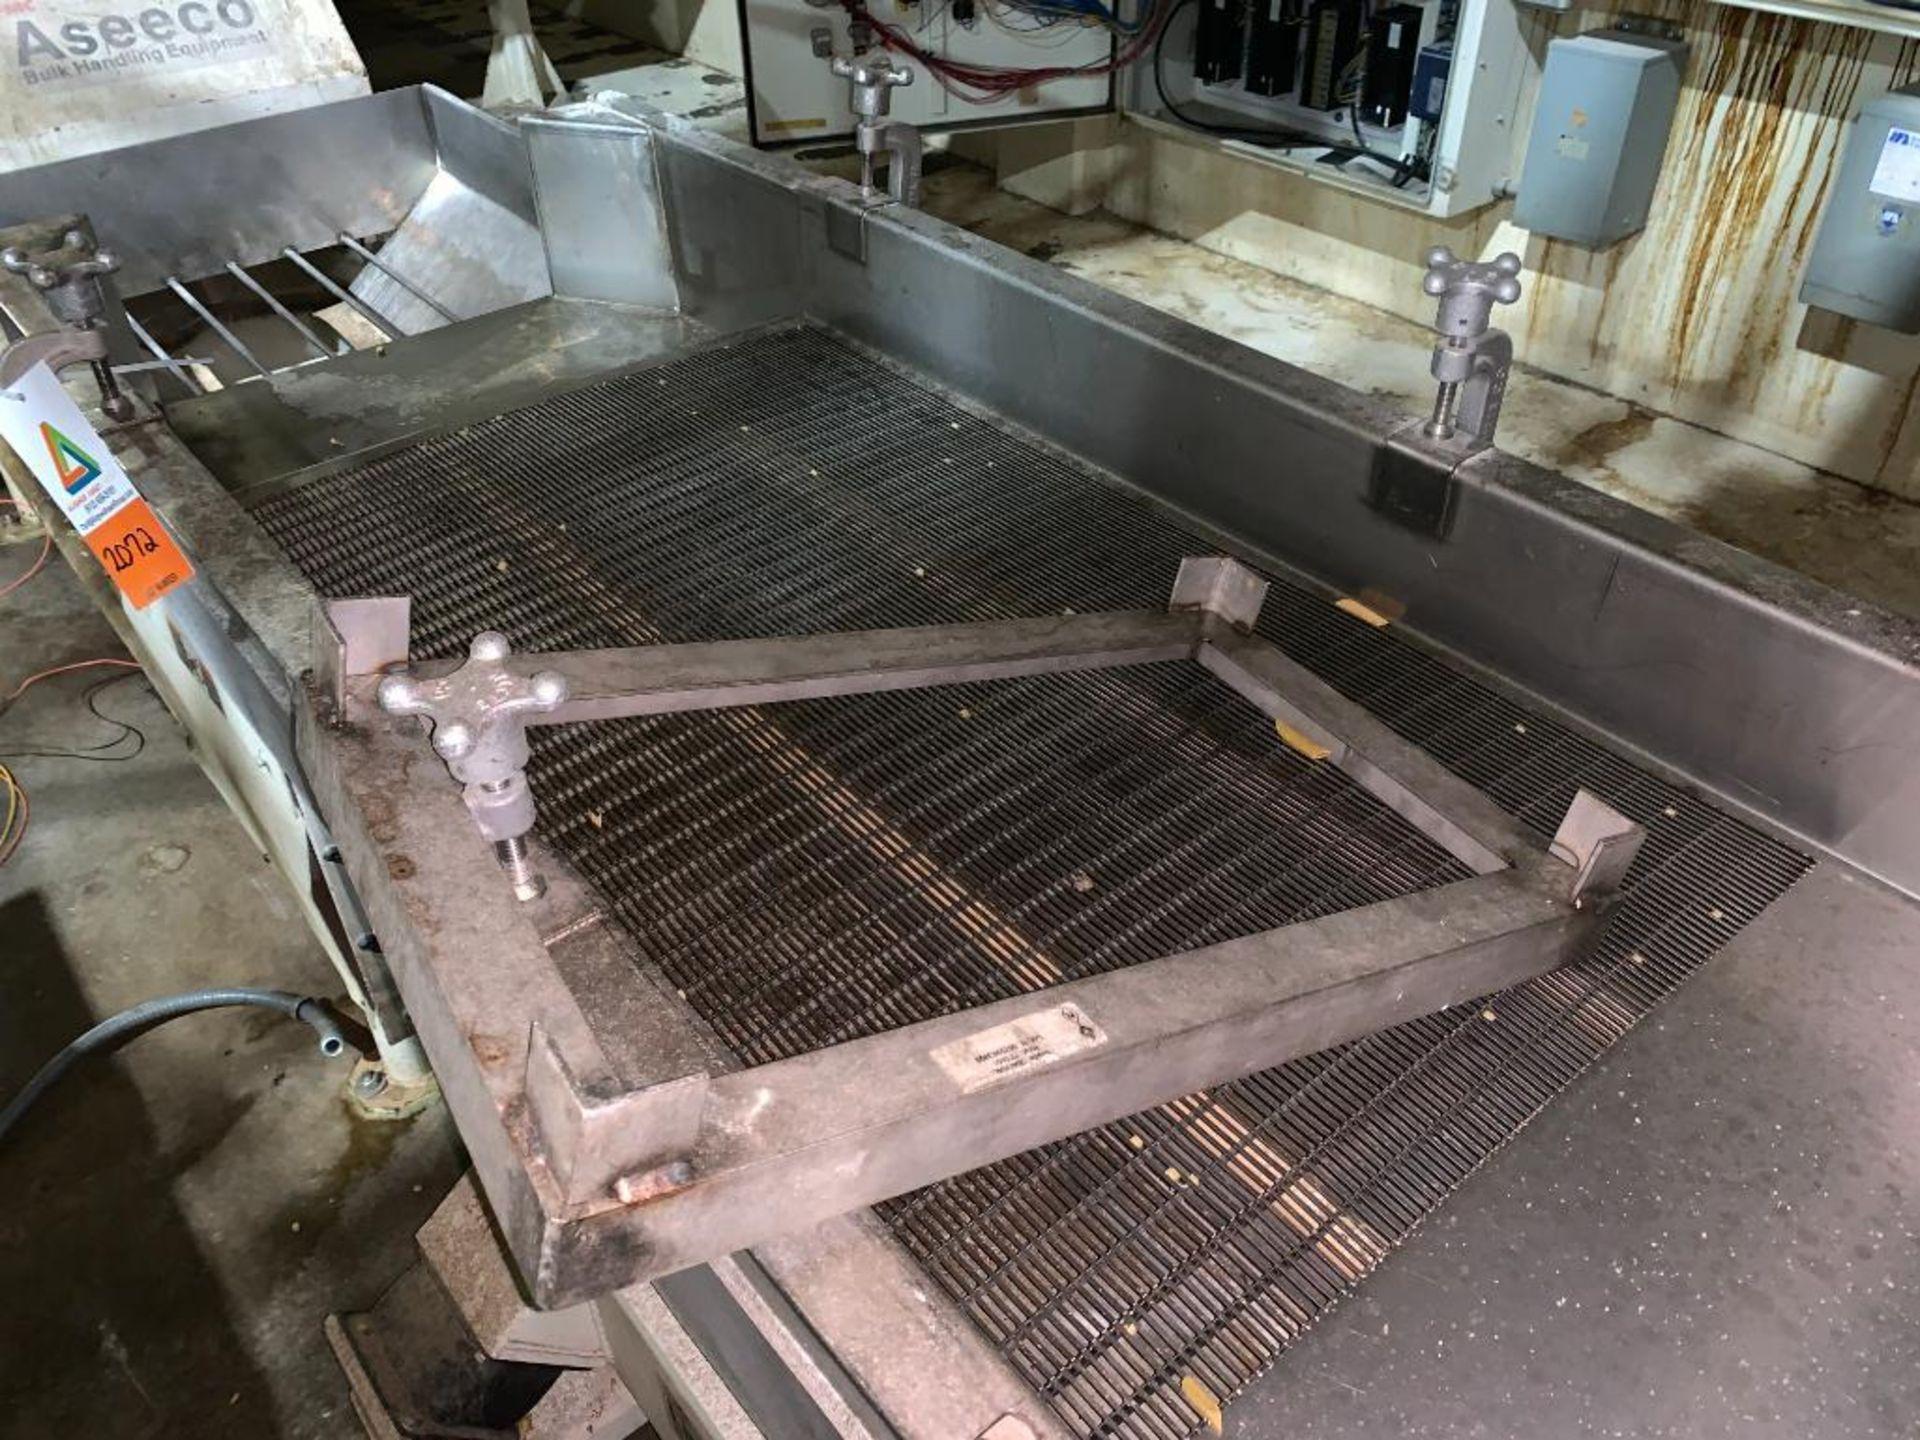 1993 Link-Belt stainless steel vibratory scalping conveyor - Image 8 of 10